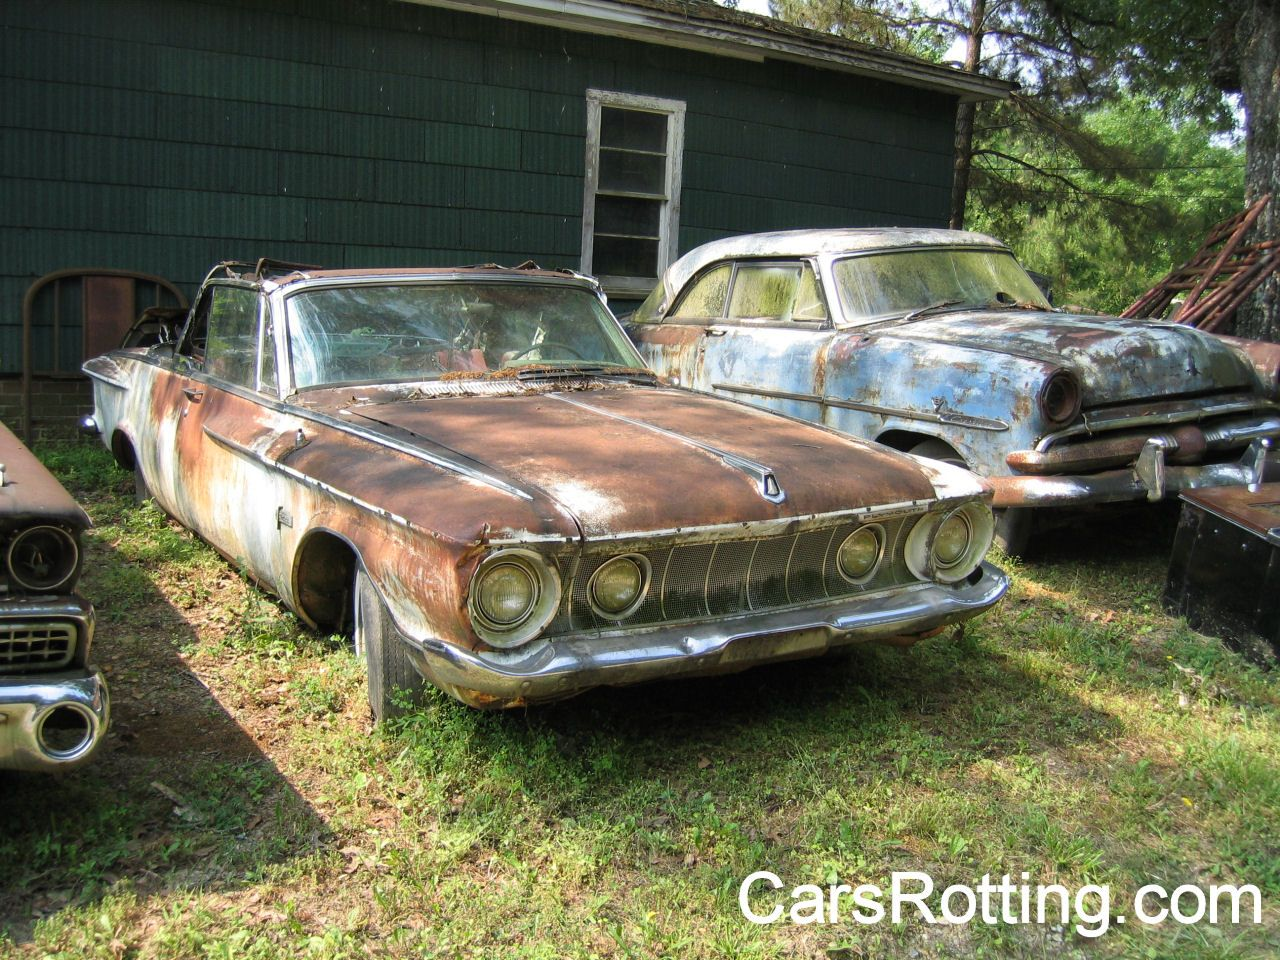 jjjjjj | Abandoned, wrecks & barn finds | Pinterest | Car photos ...